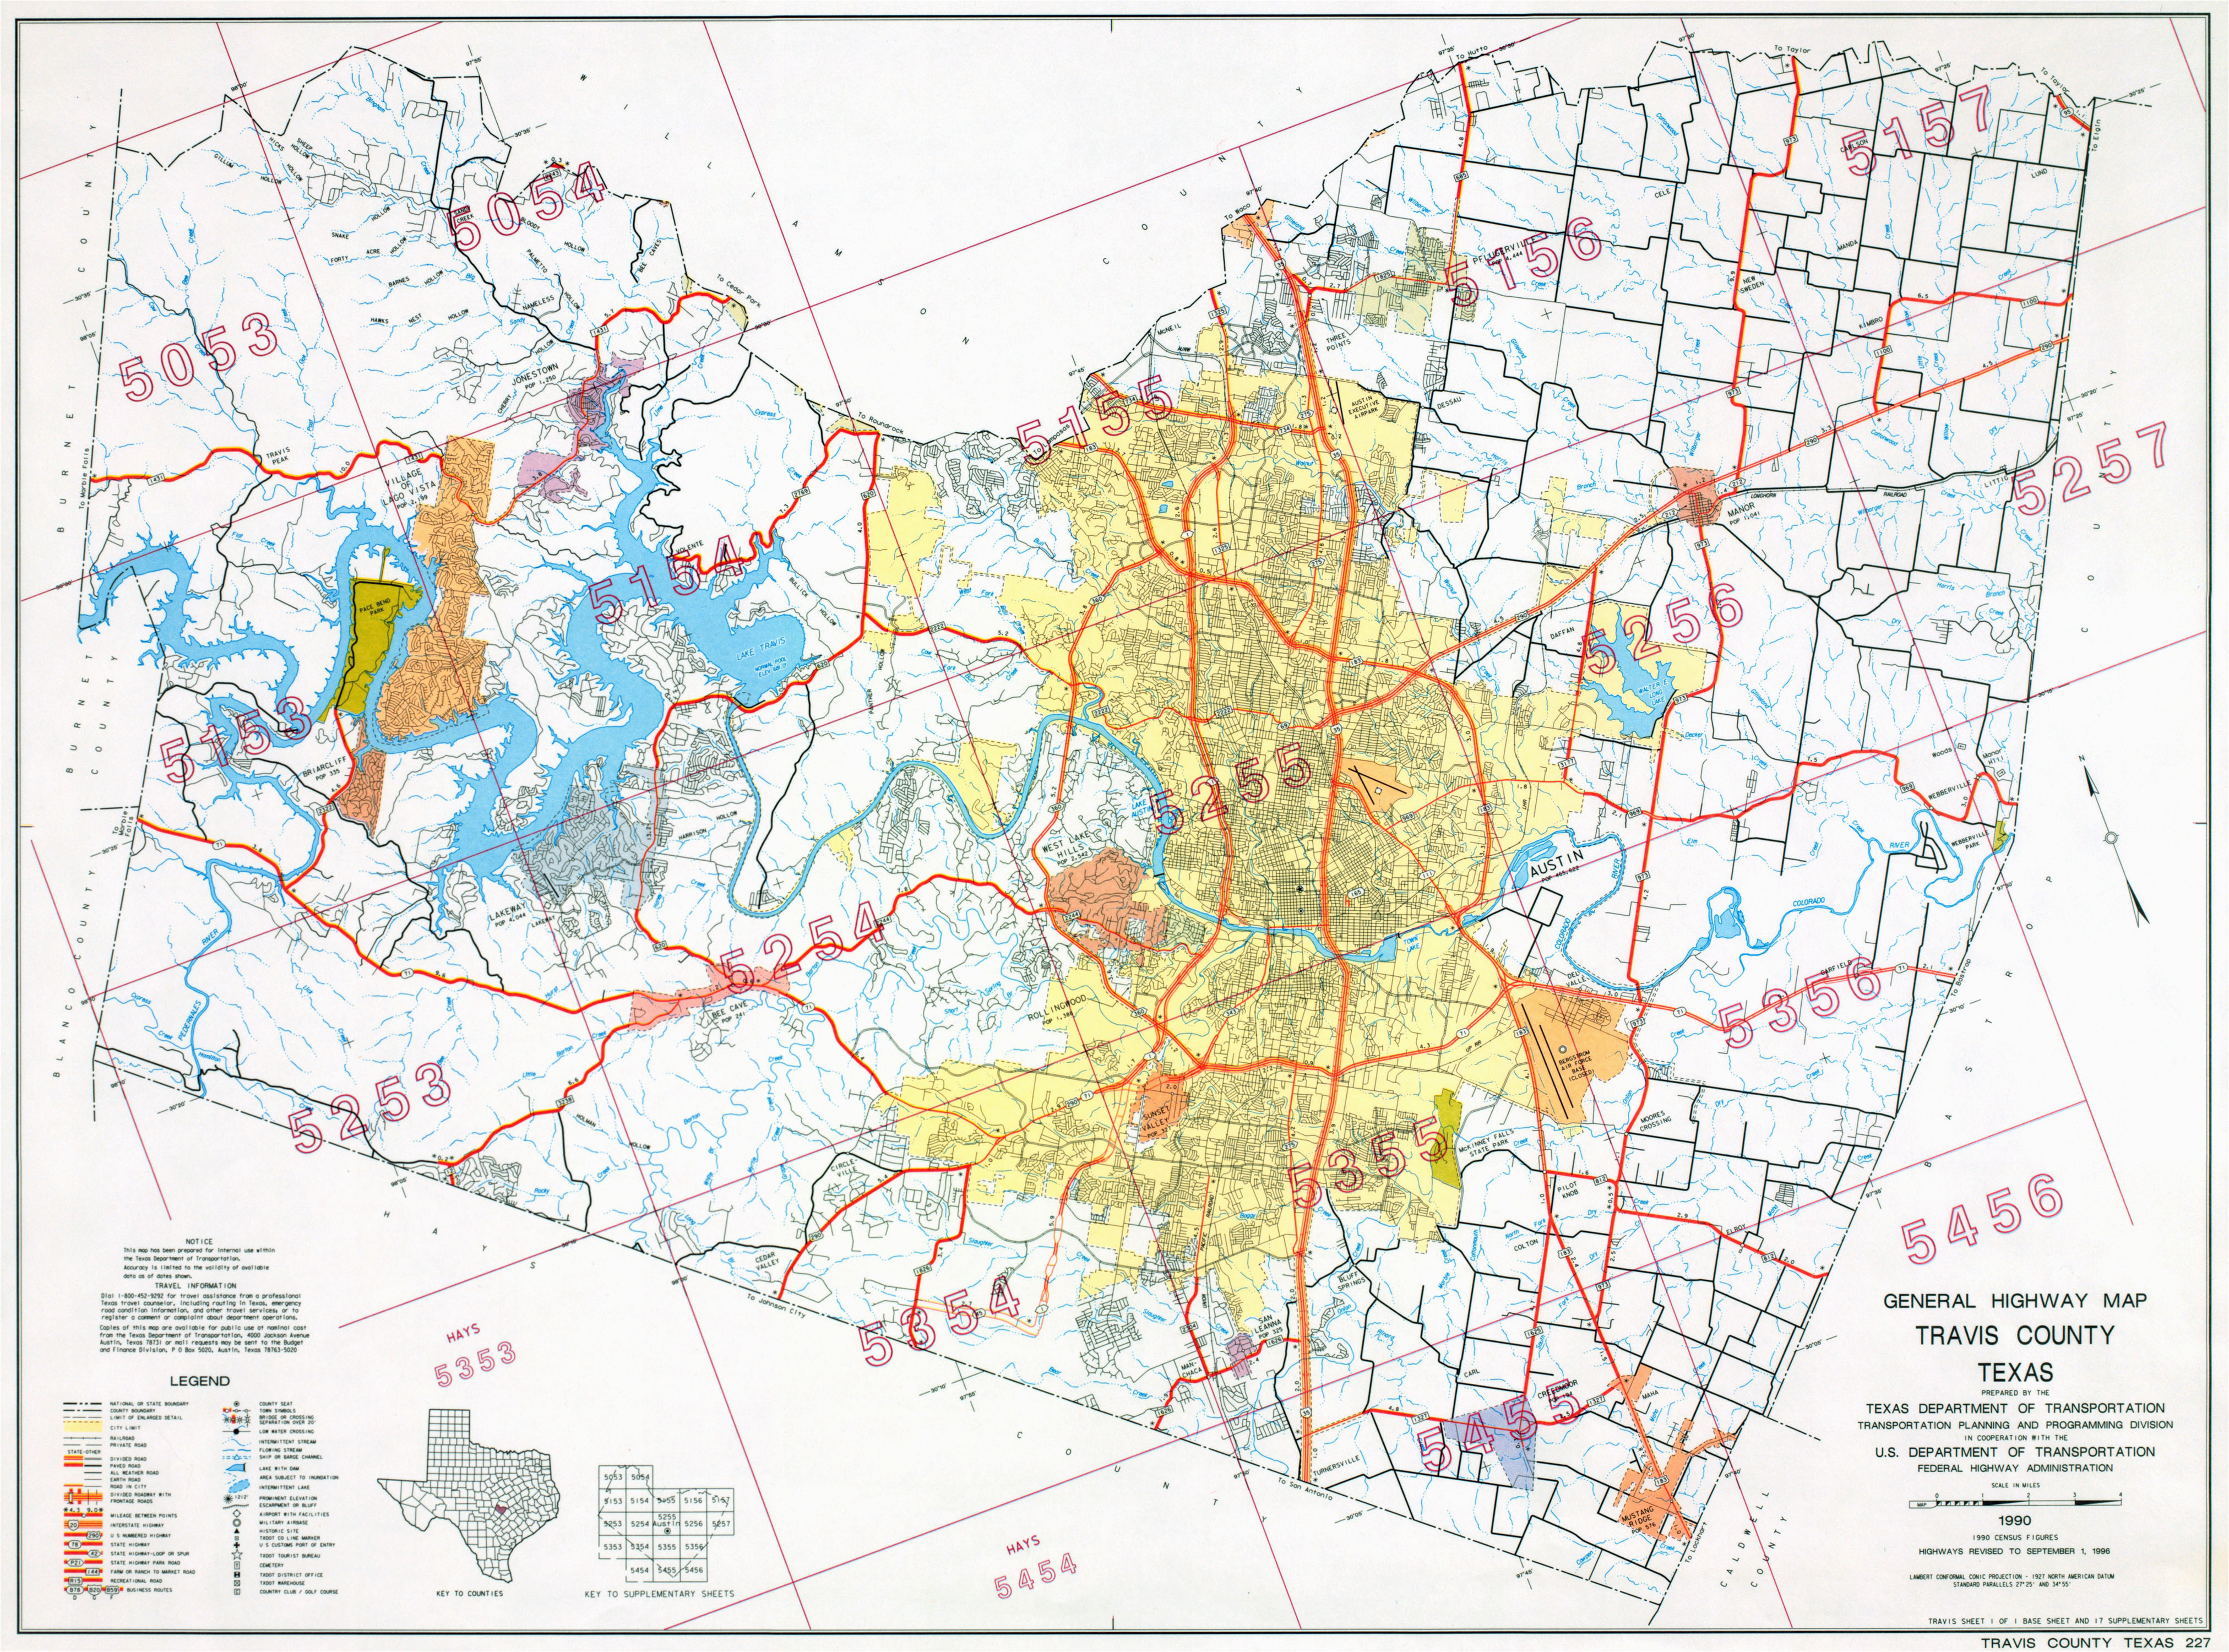 Map Of Austin Texas Zip Codes Amarillo Tx Zip Code Lovely Map Texas Showing Austin Map City Austin